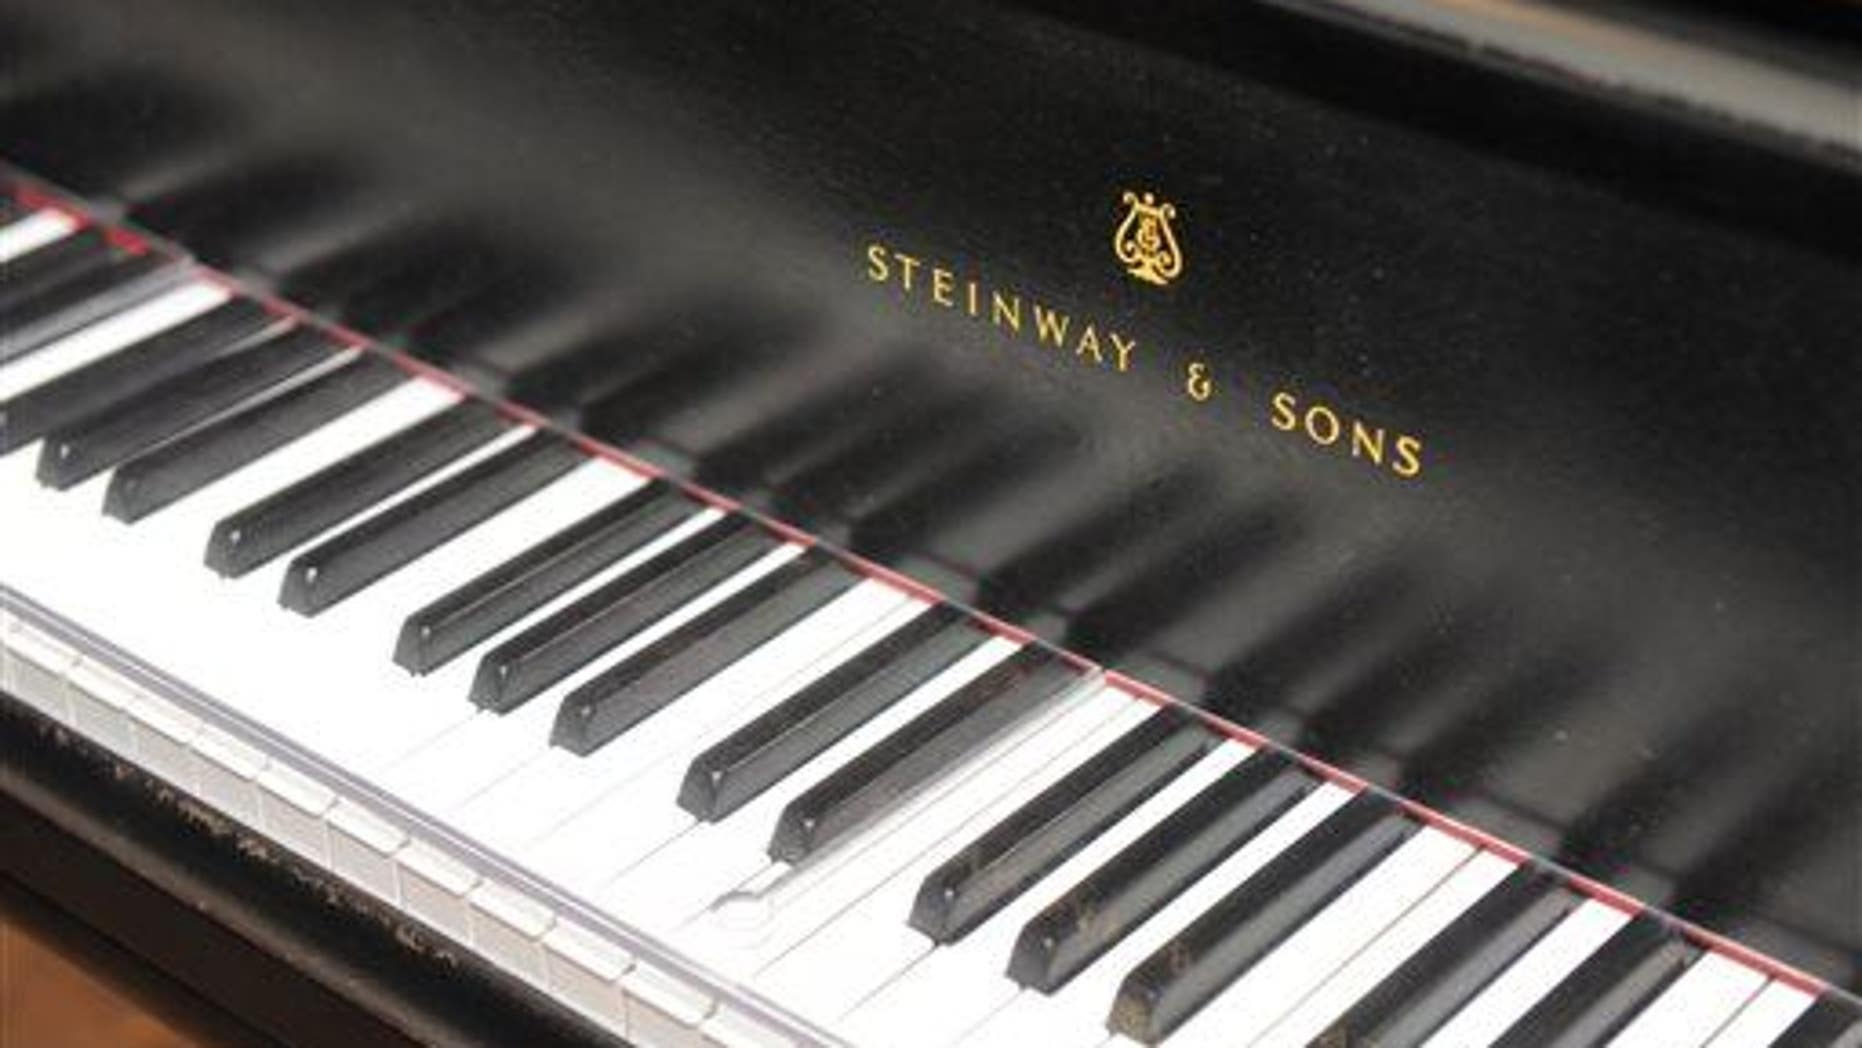 File photo of a piano.